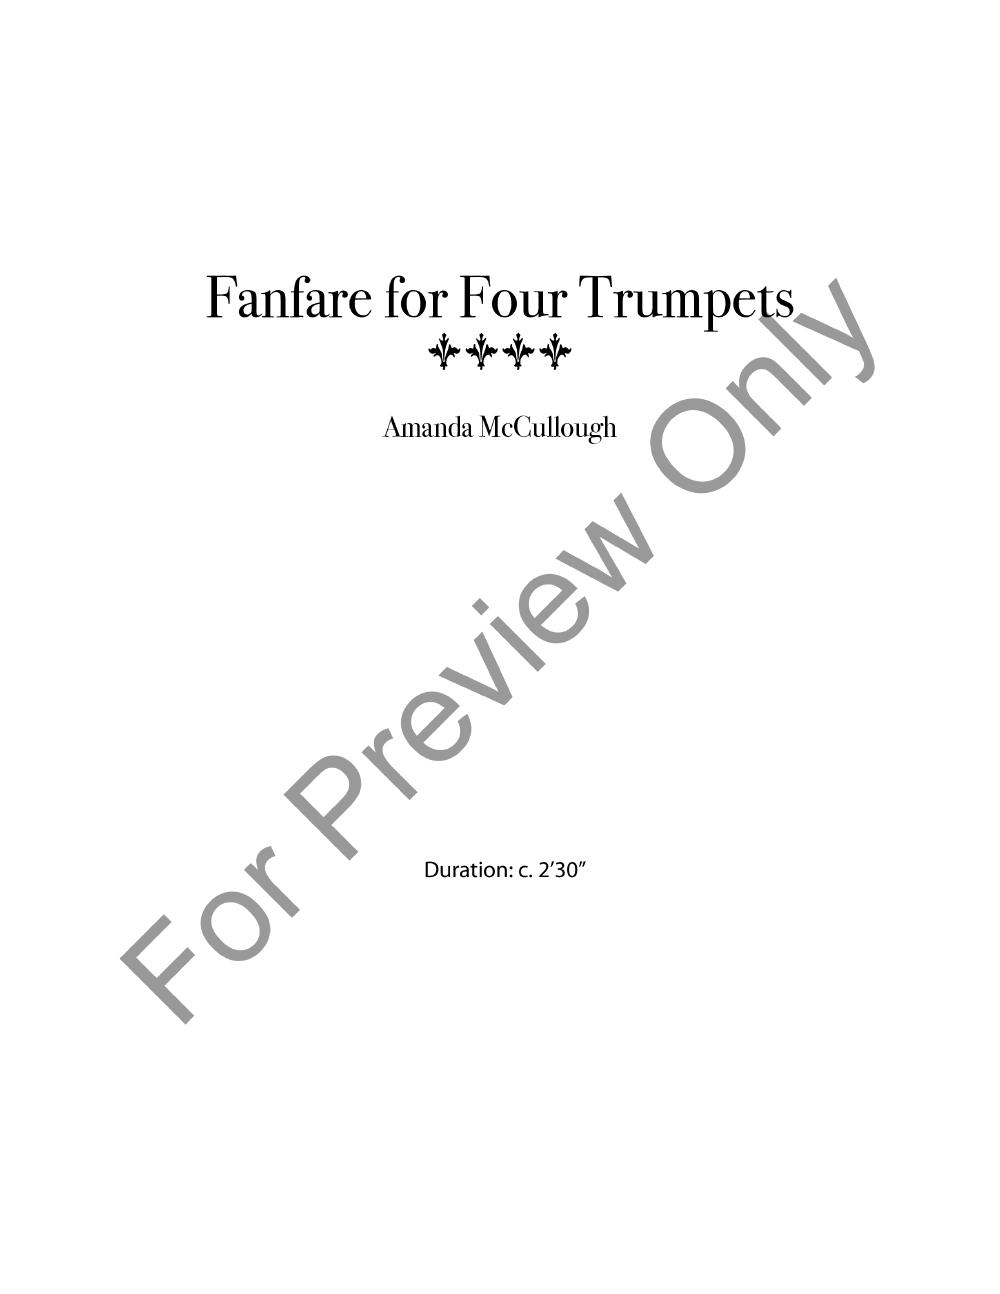 Fanfare for Four Trumpets Thumbnail